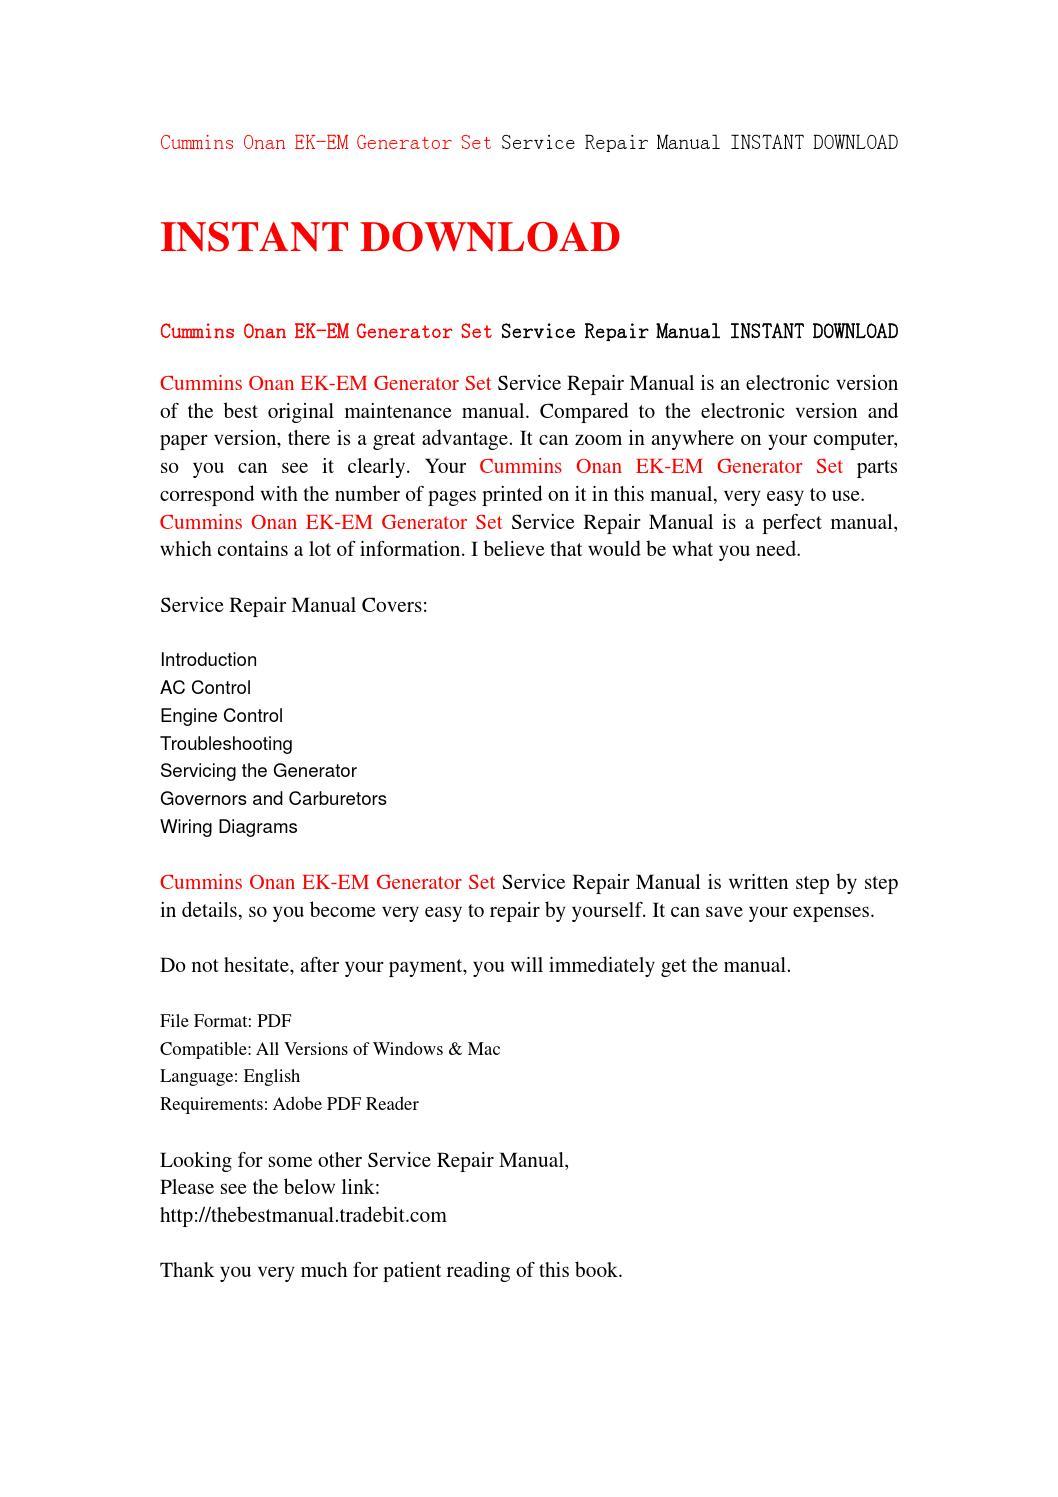 Cummins onan ek em generator set service repair manual instant download by  jjfhnsjefn - issuu